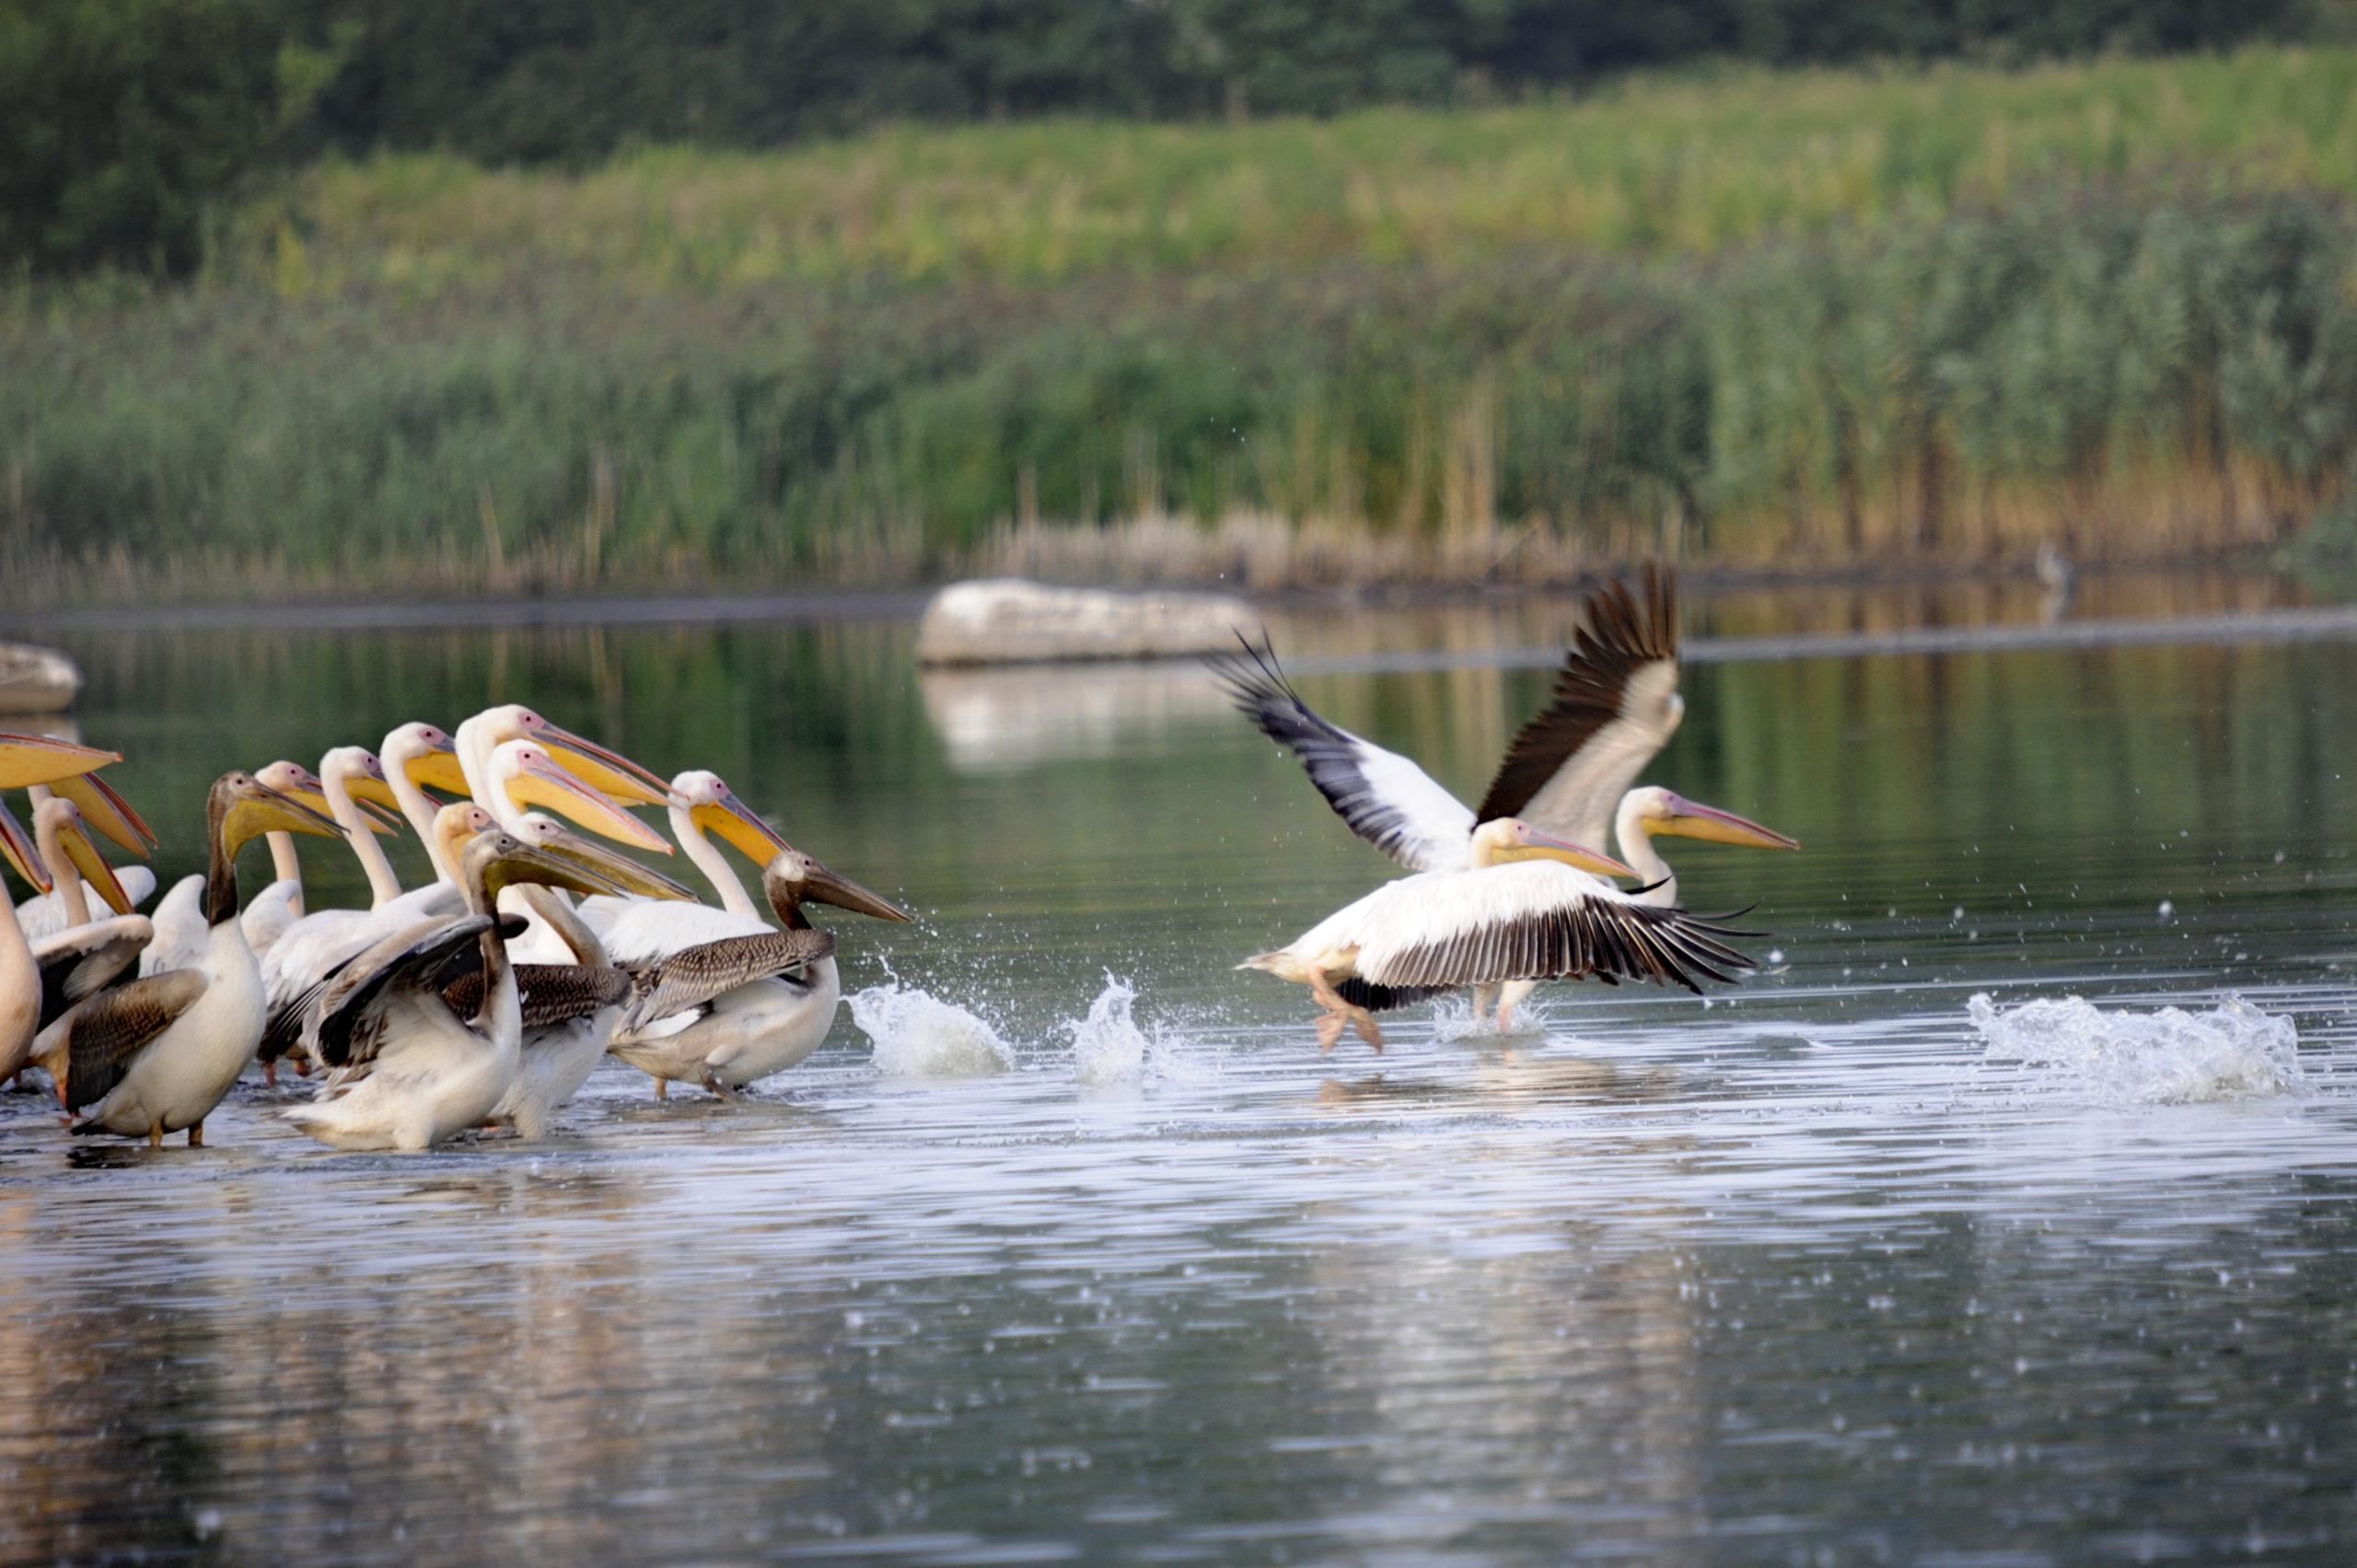 На озеро в Яловенском районе прилетели пеликаны. Фоторепортаж NM